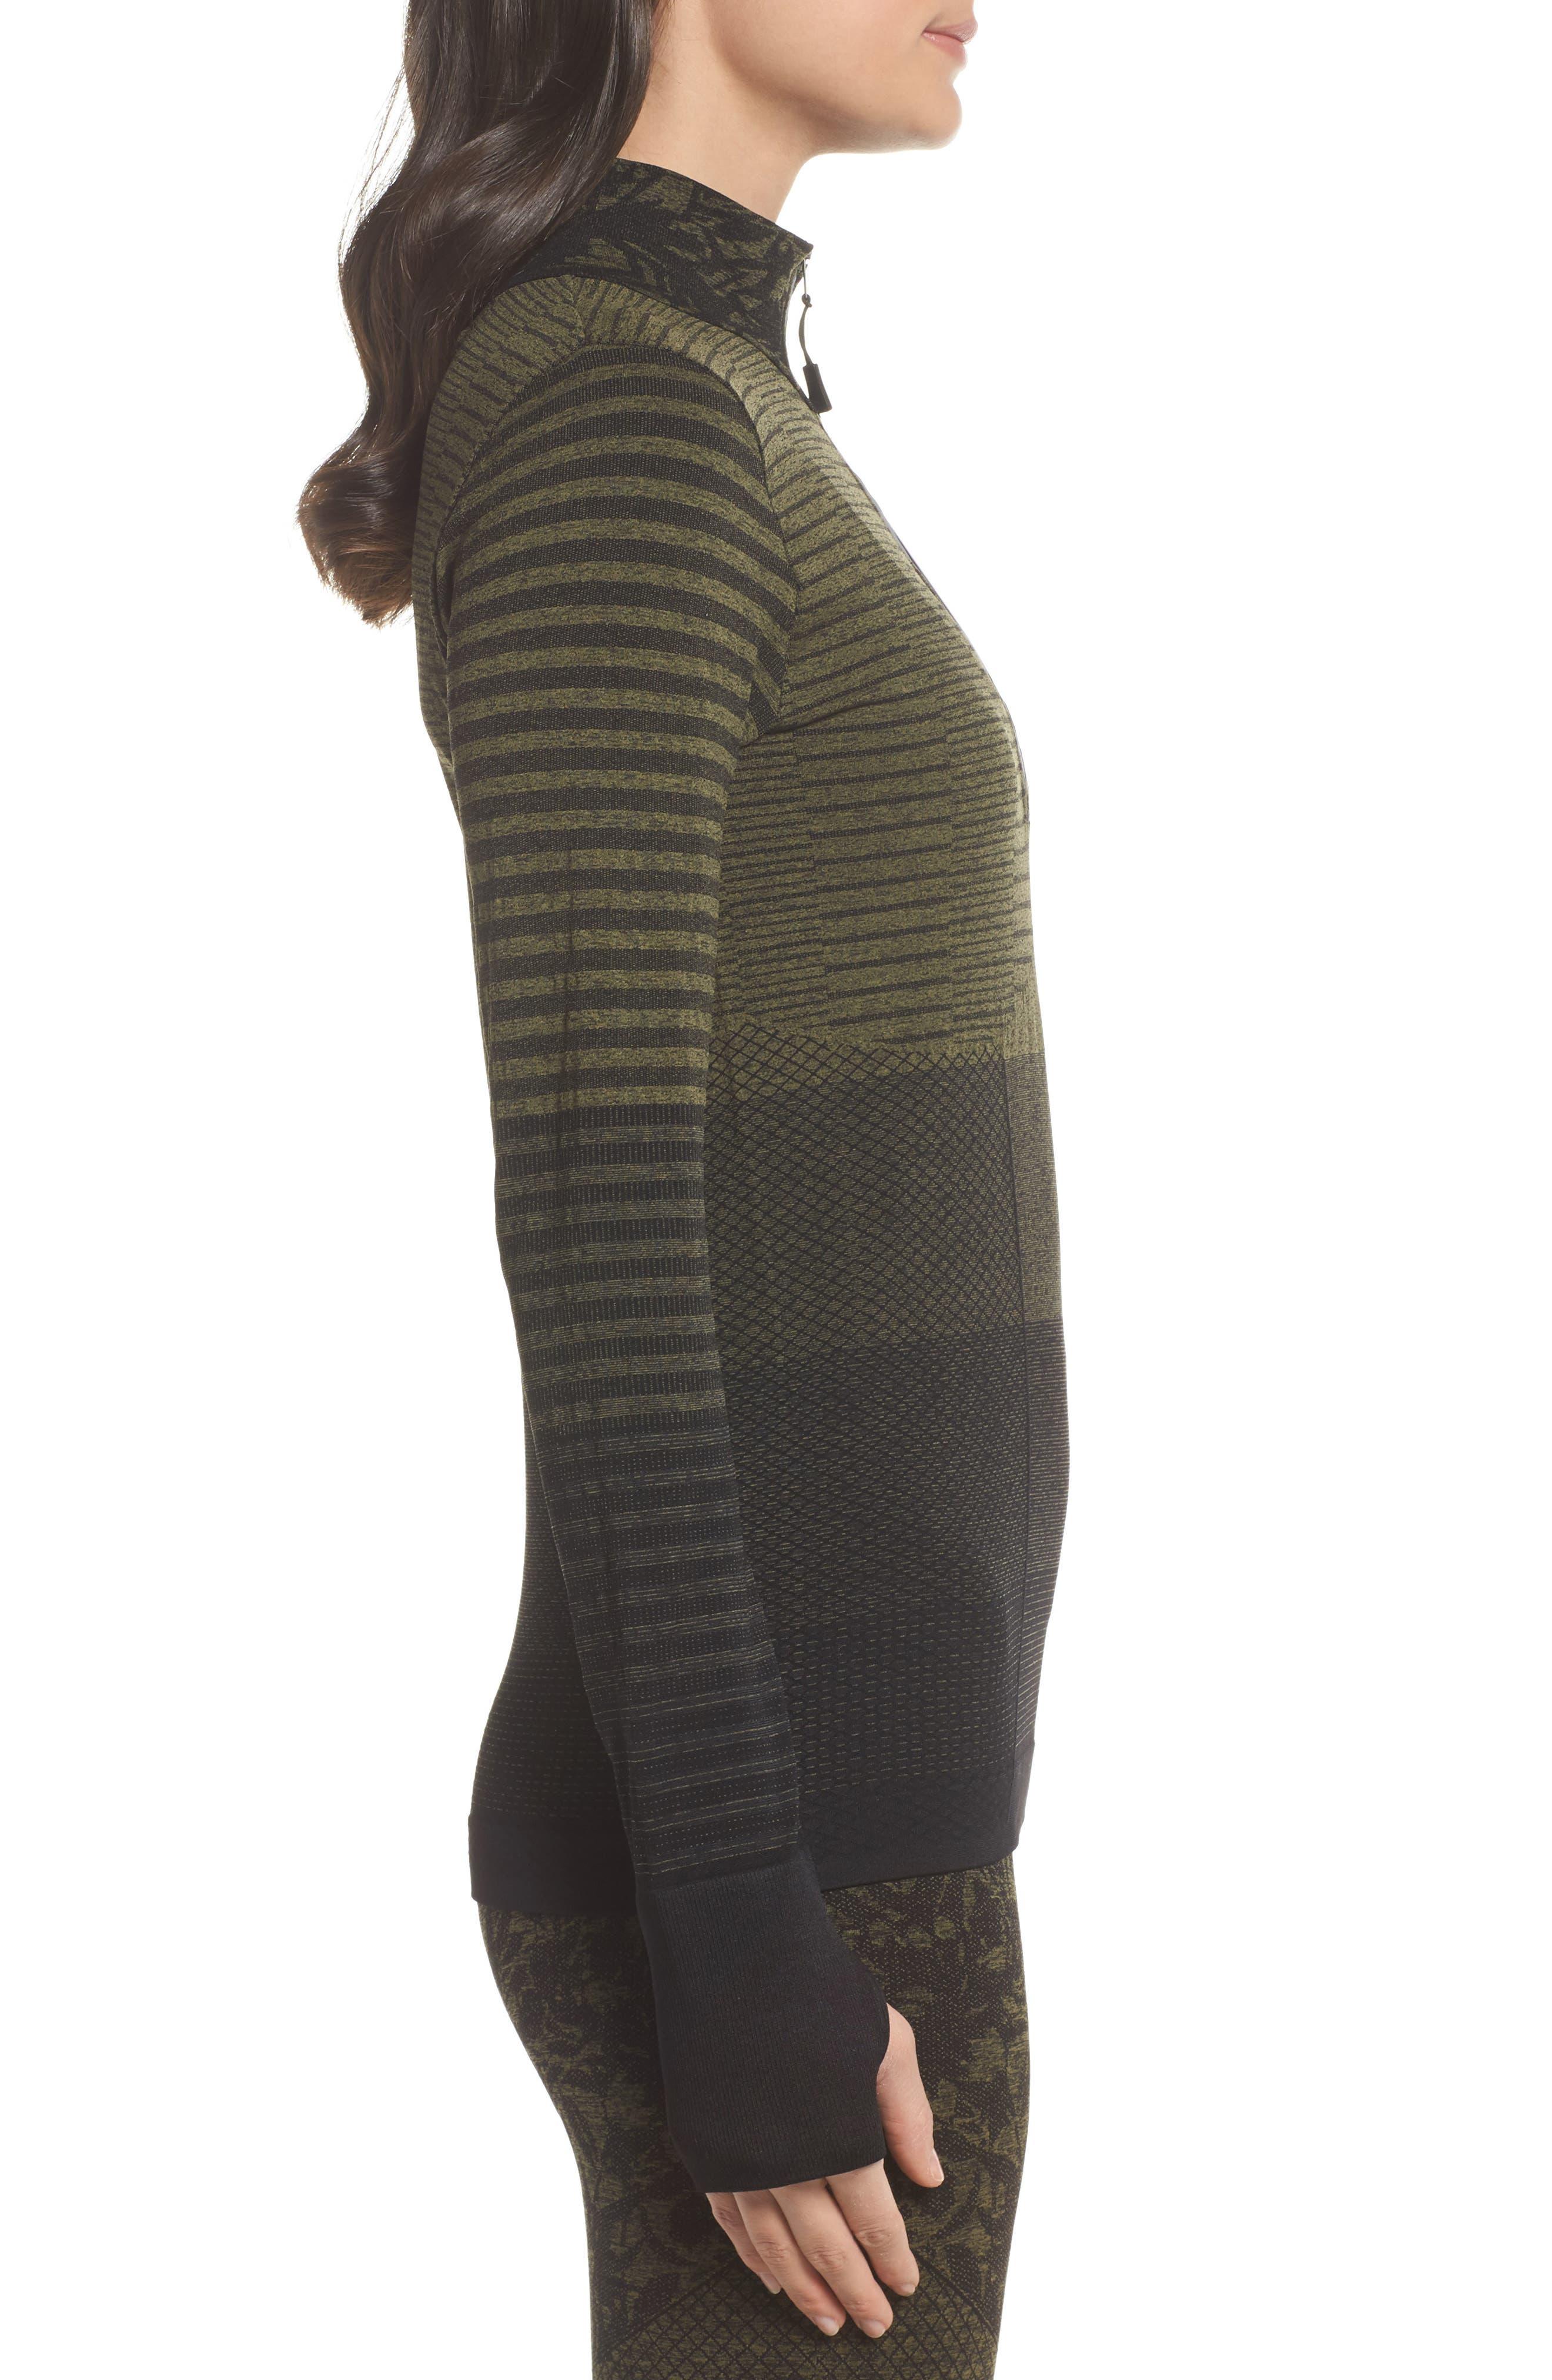 Vitality Quarter Zip Pullover,                             Alternate thumbnail 3, color,                             Deep Lichen Green/ Black